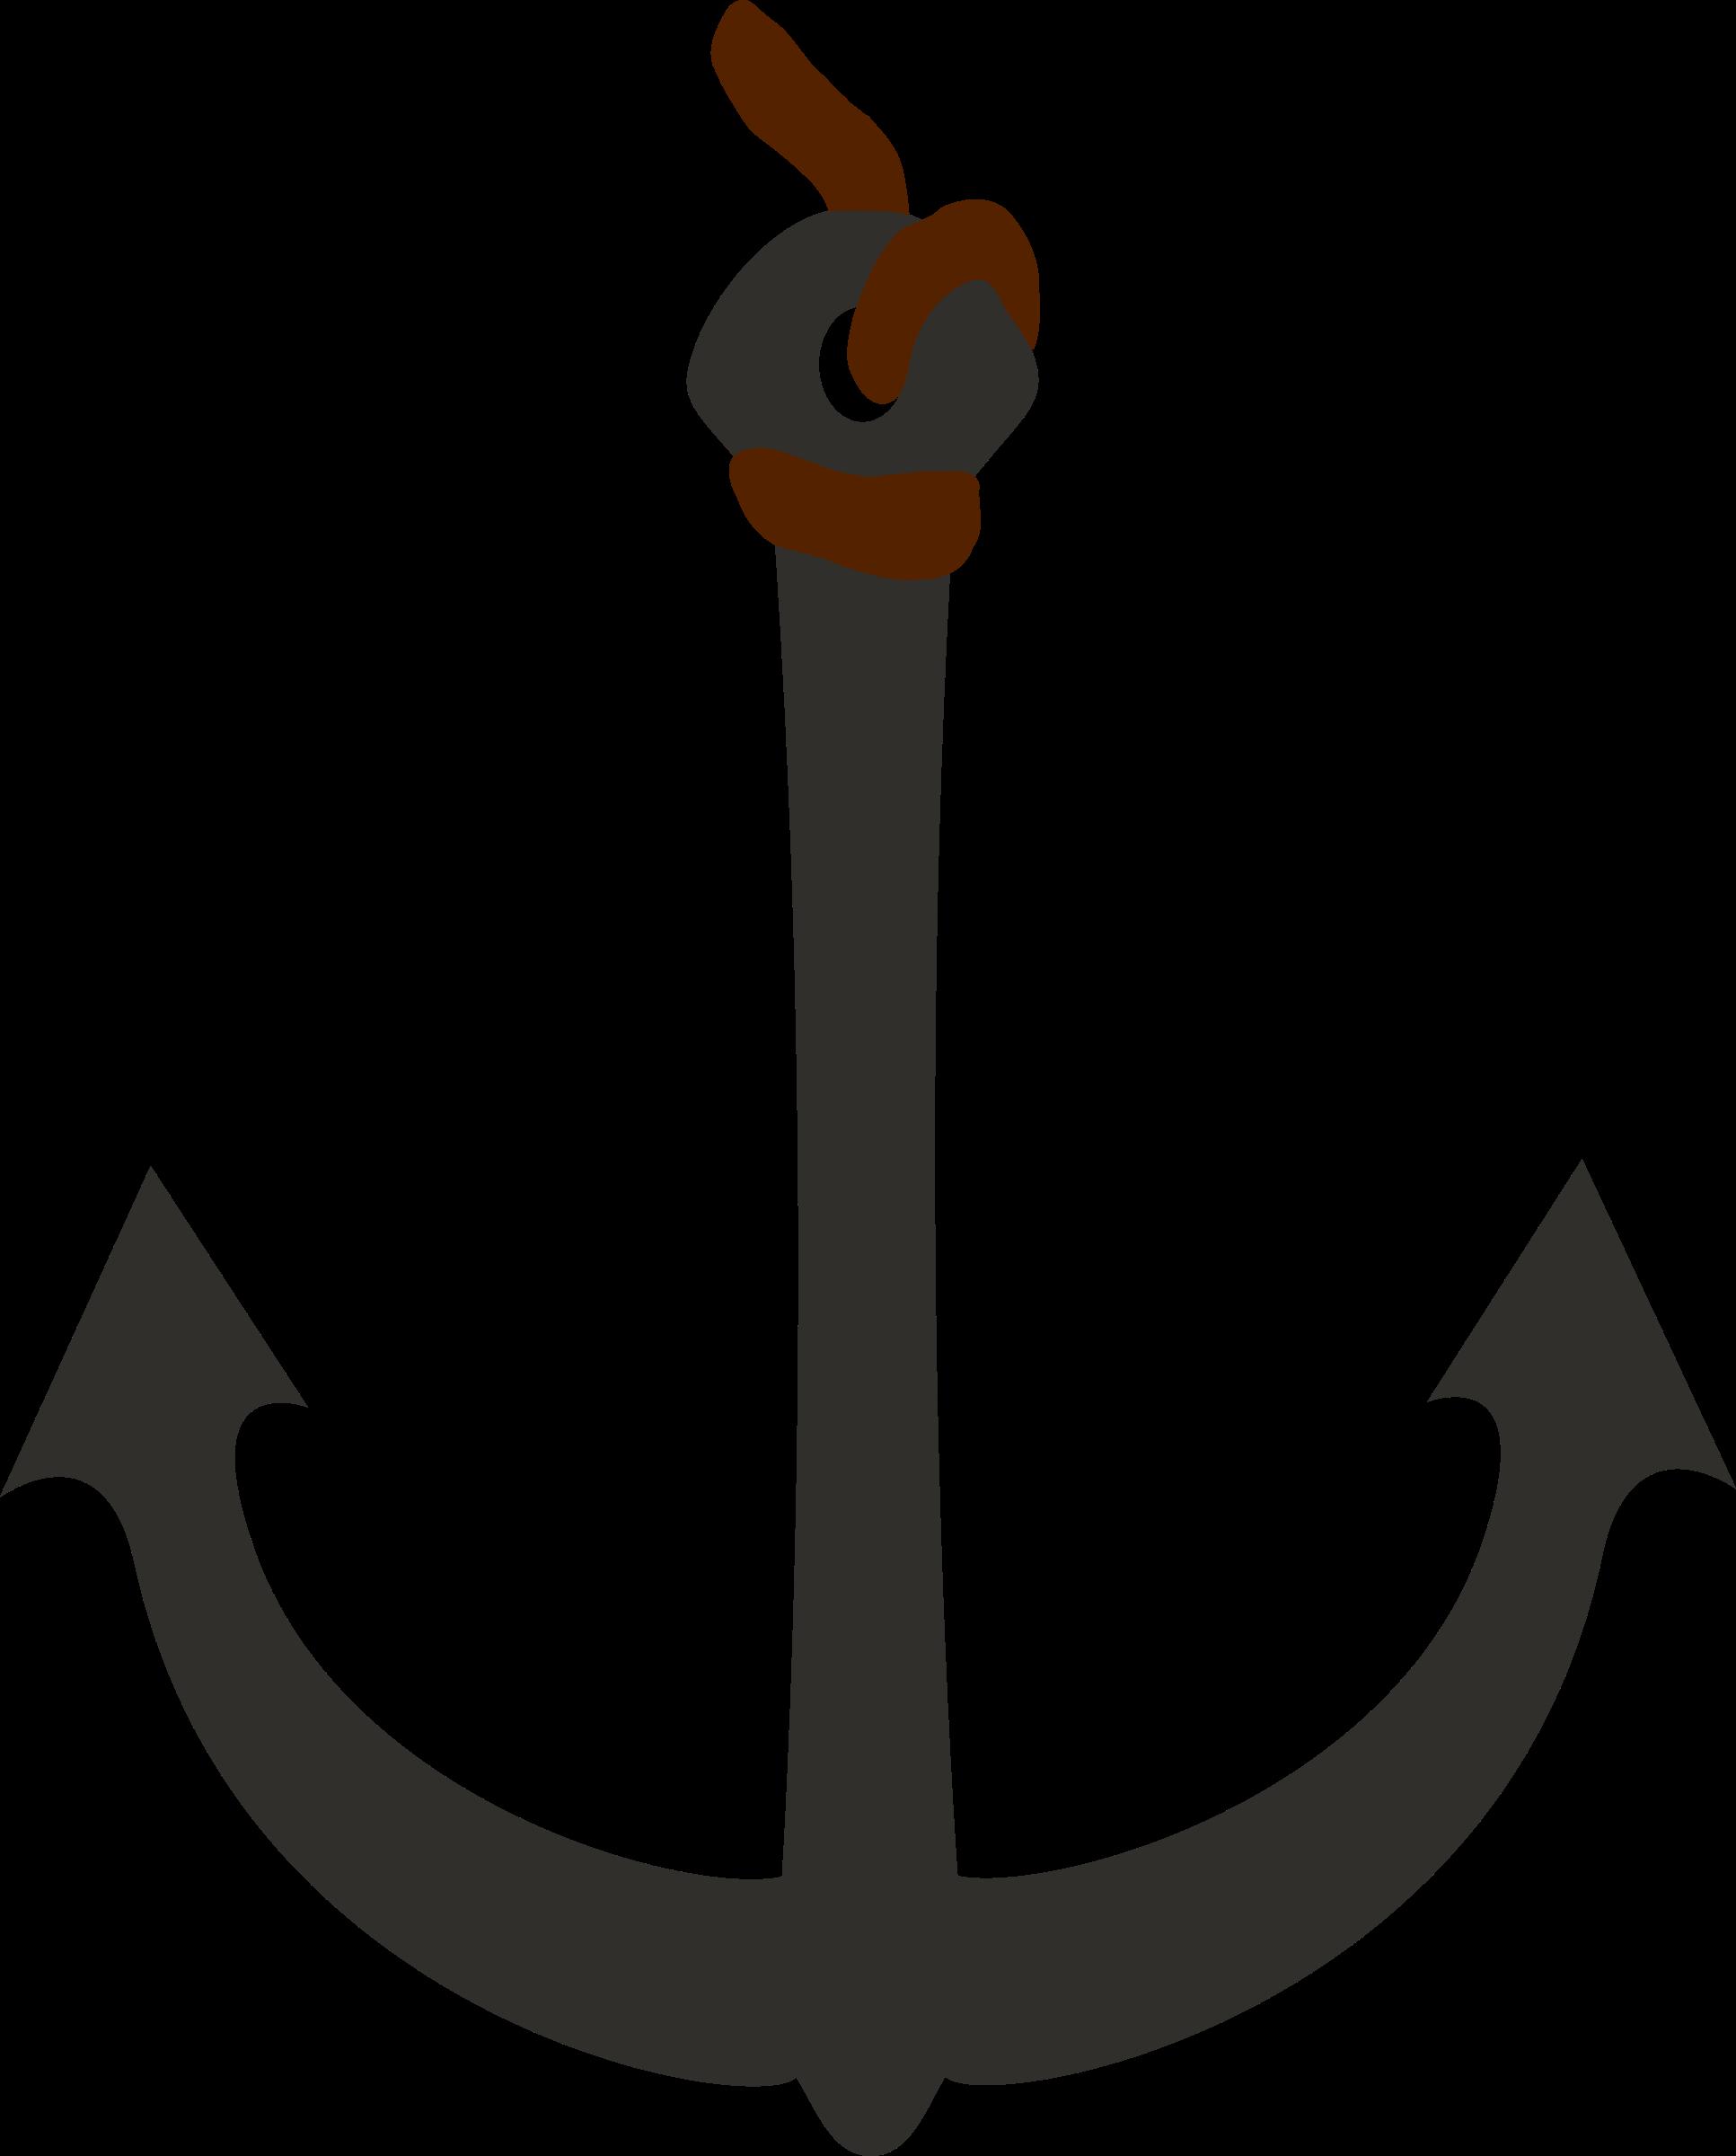 Anchor Png Image Anchor Png Anchor Clip Art Downloadable Art